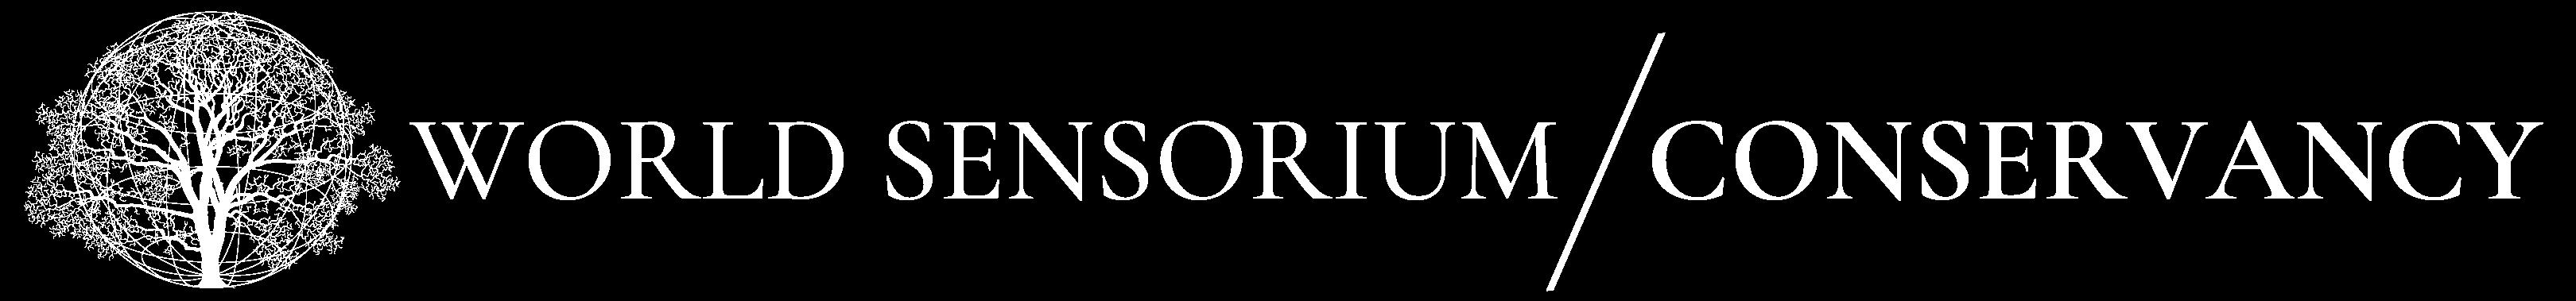 World Sensorium/Conservancy